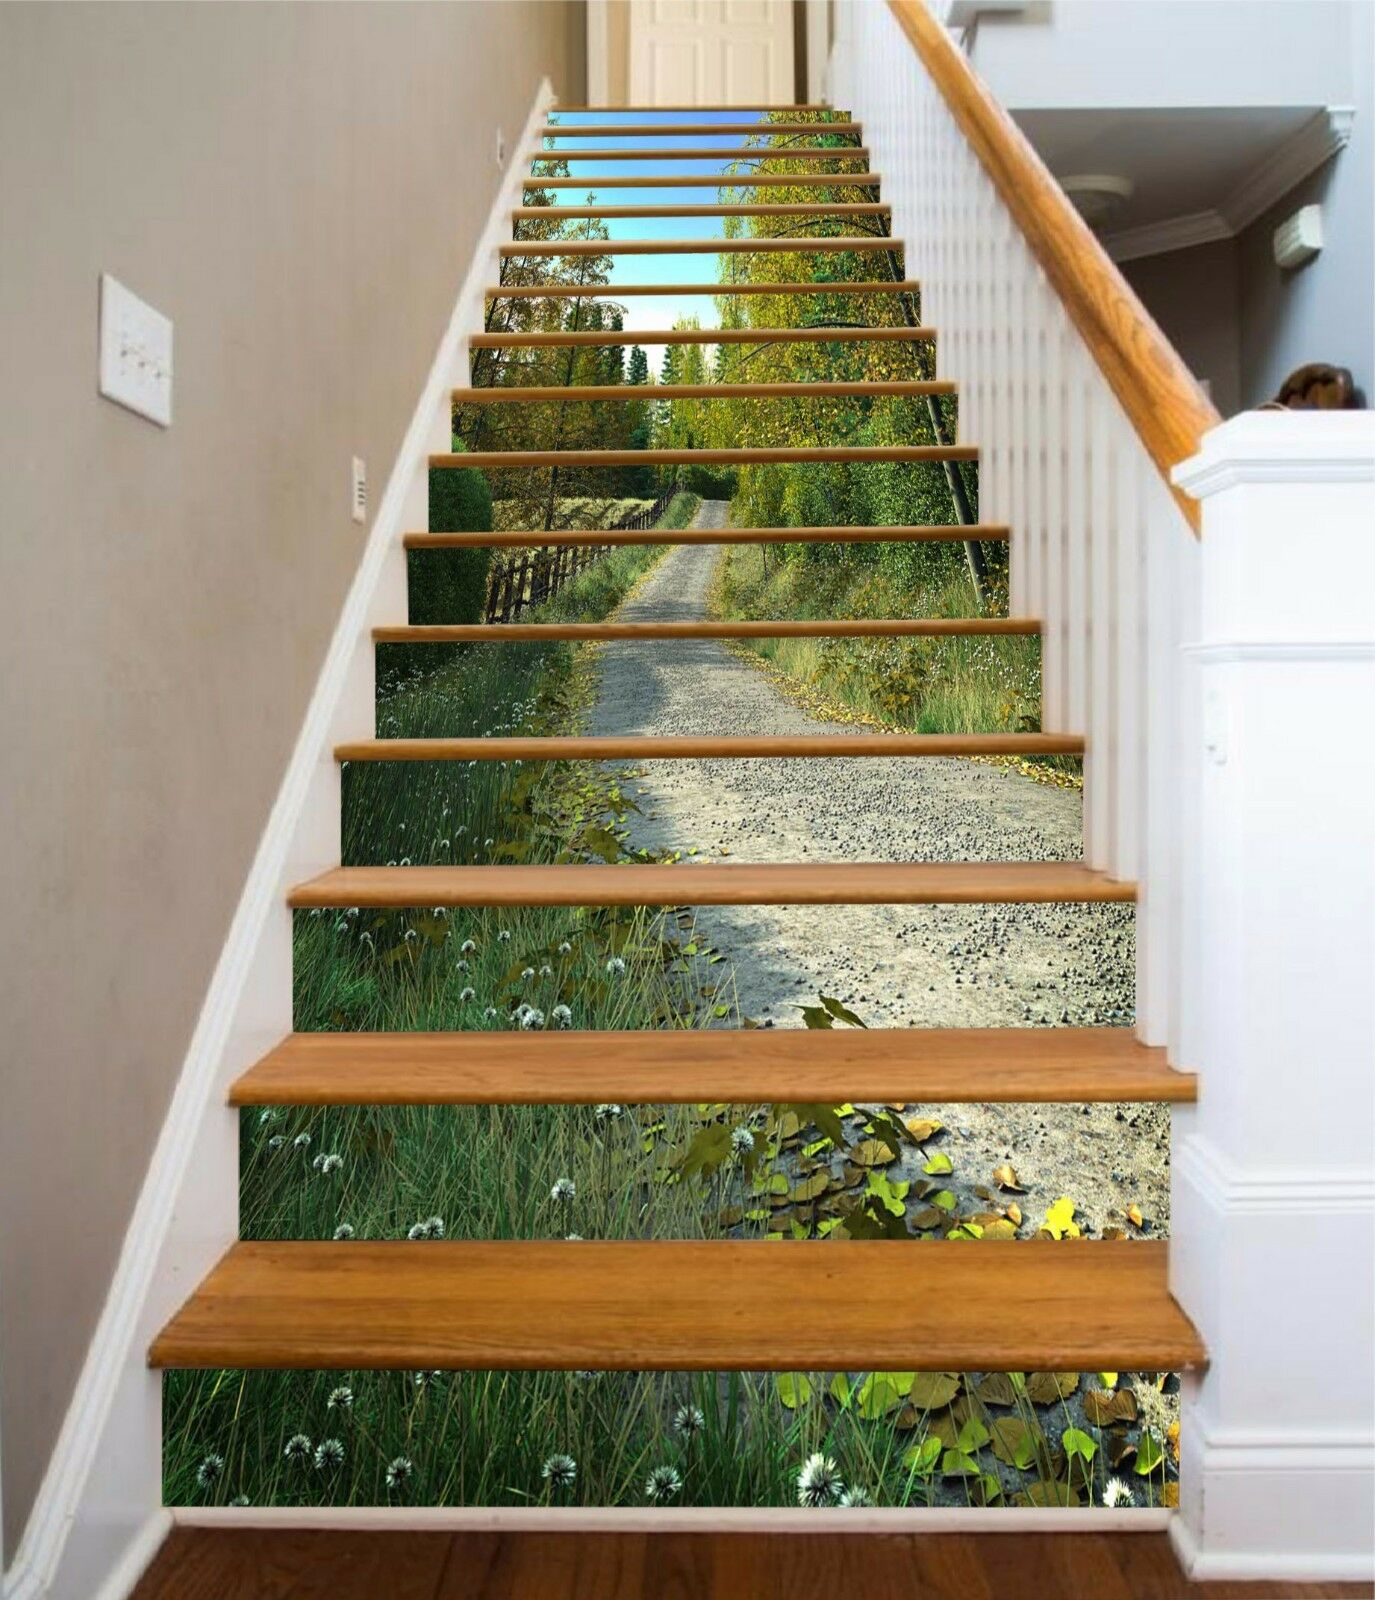 3D Grass Path 563 Stair Risers Decoration Photo Mural Vinyl Decal Wallpaper AU